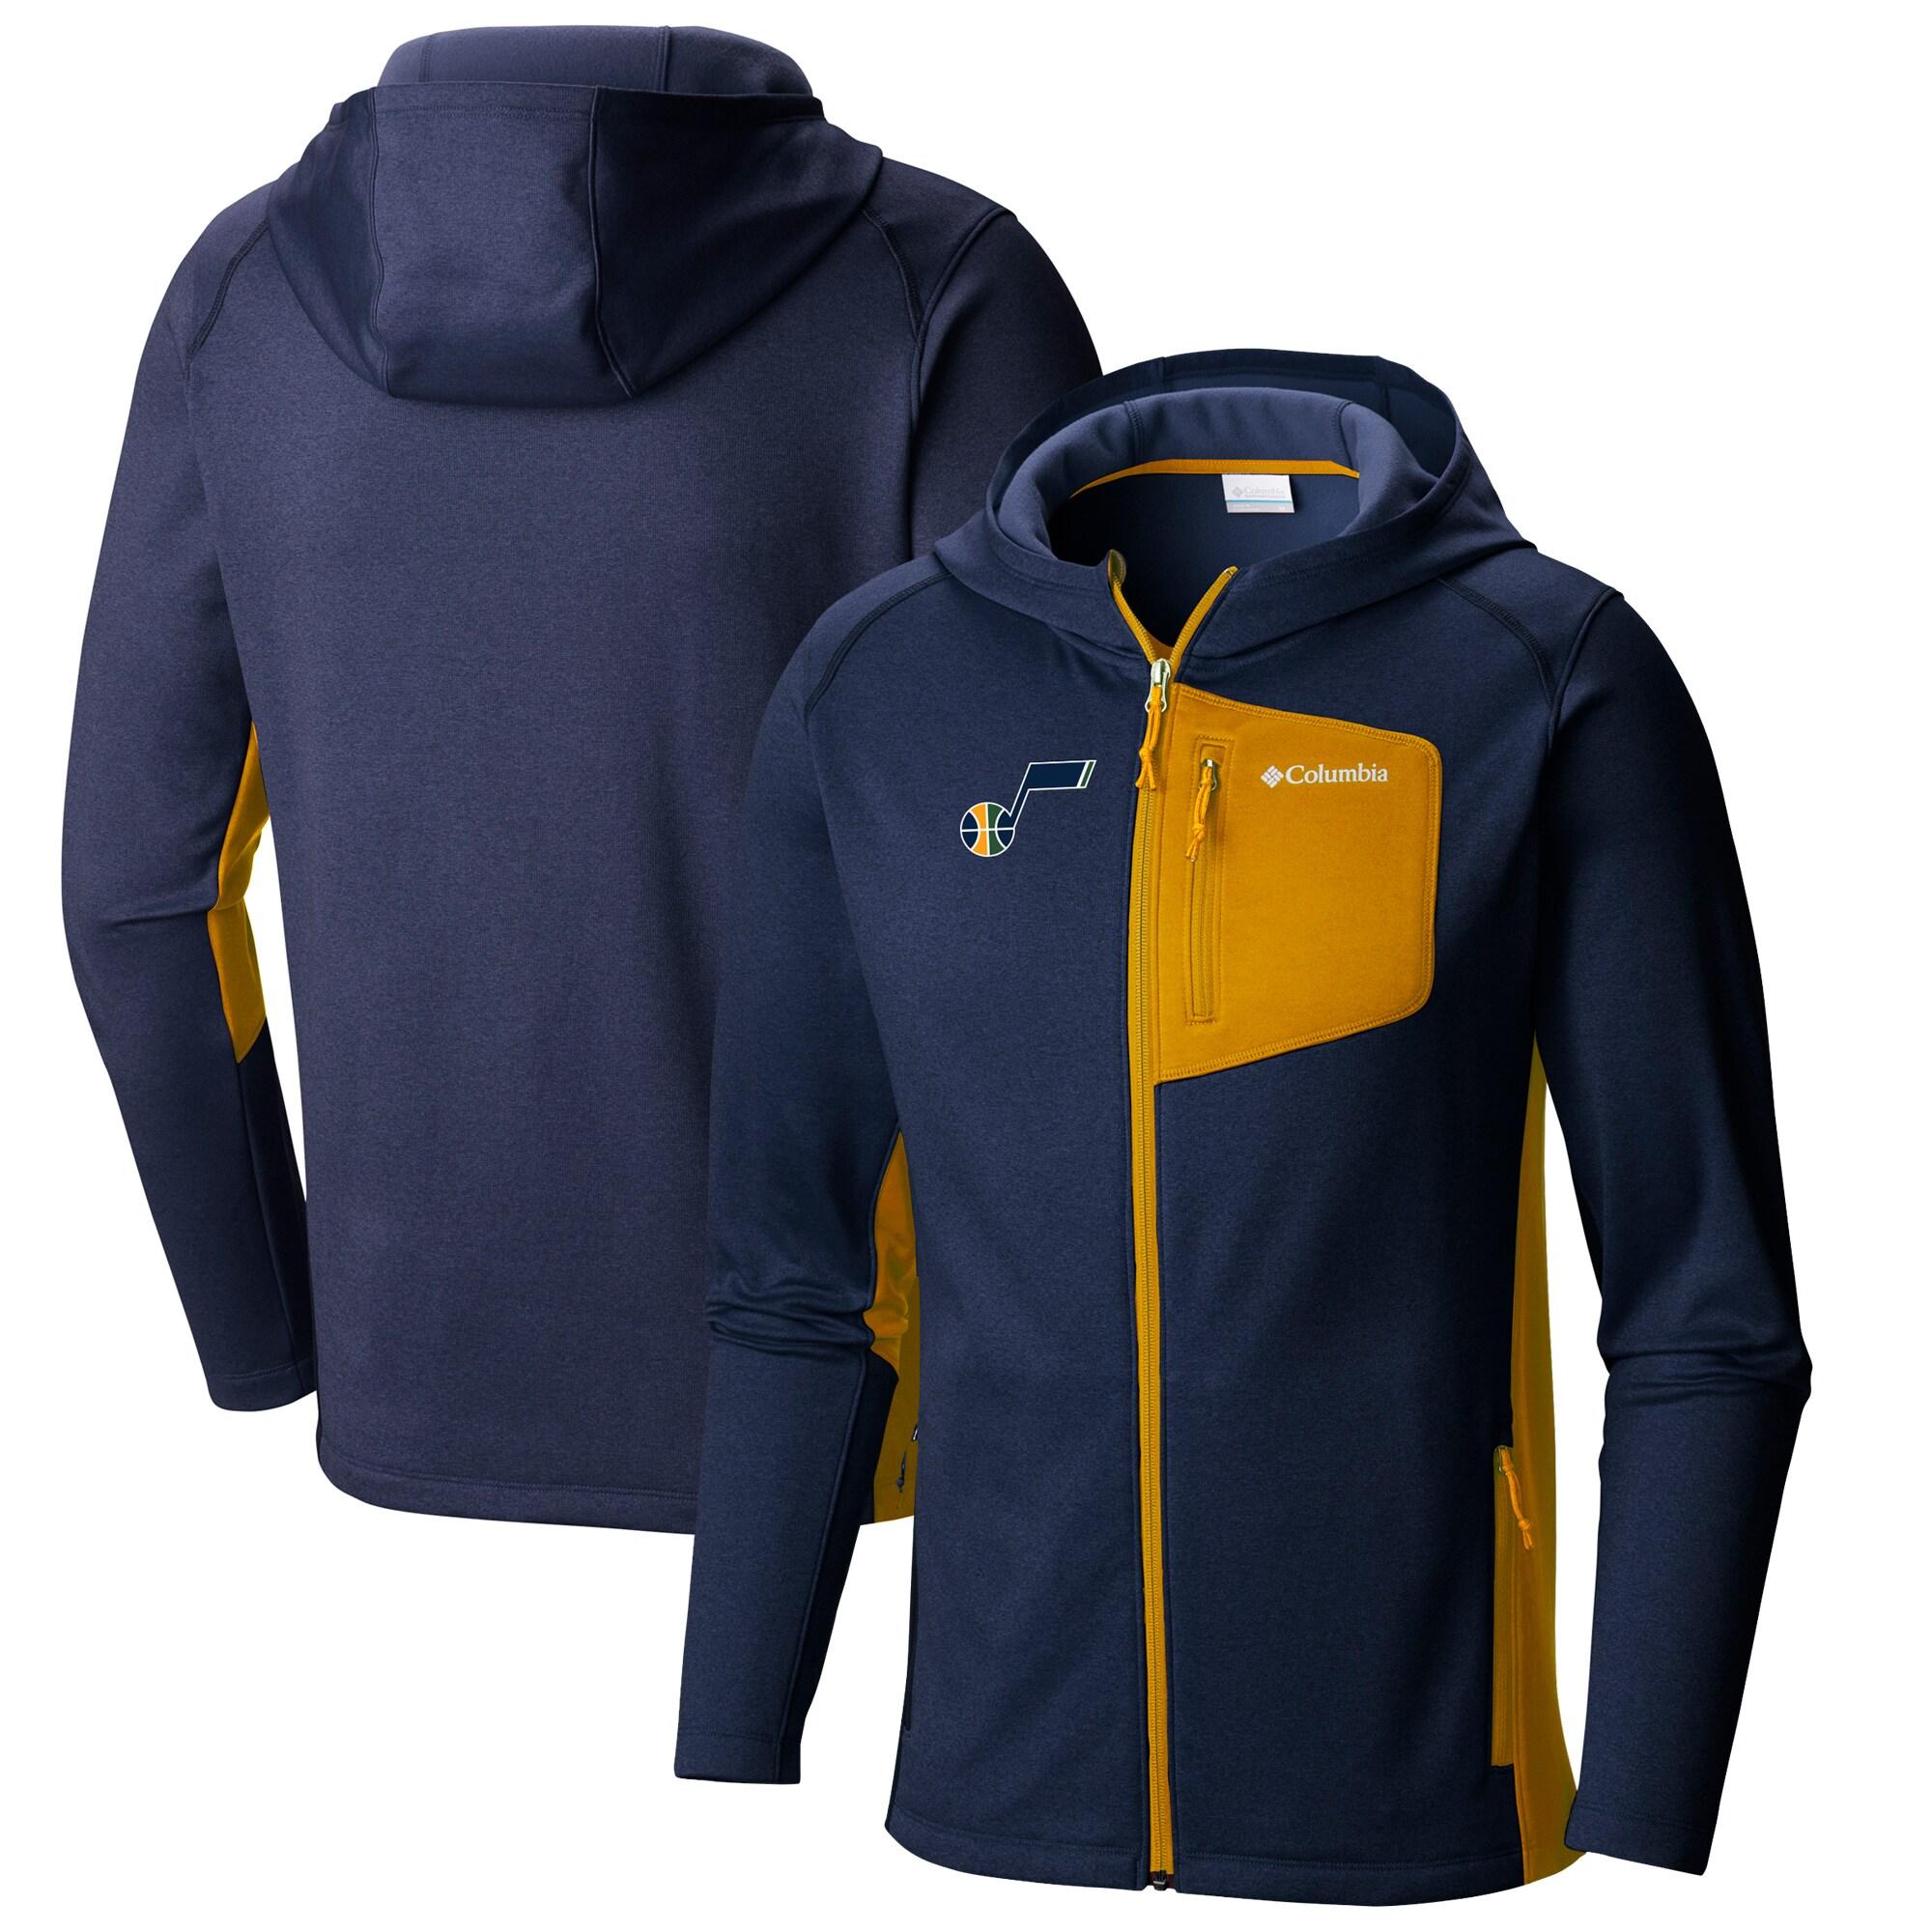 Utah Jazz Columbia Jackson Creek Full-Zip Hooded Jacket - Navy/Gold